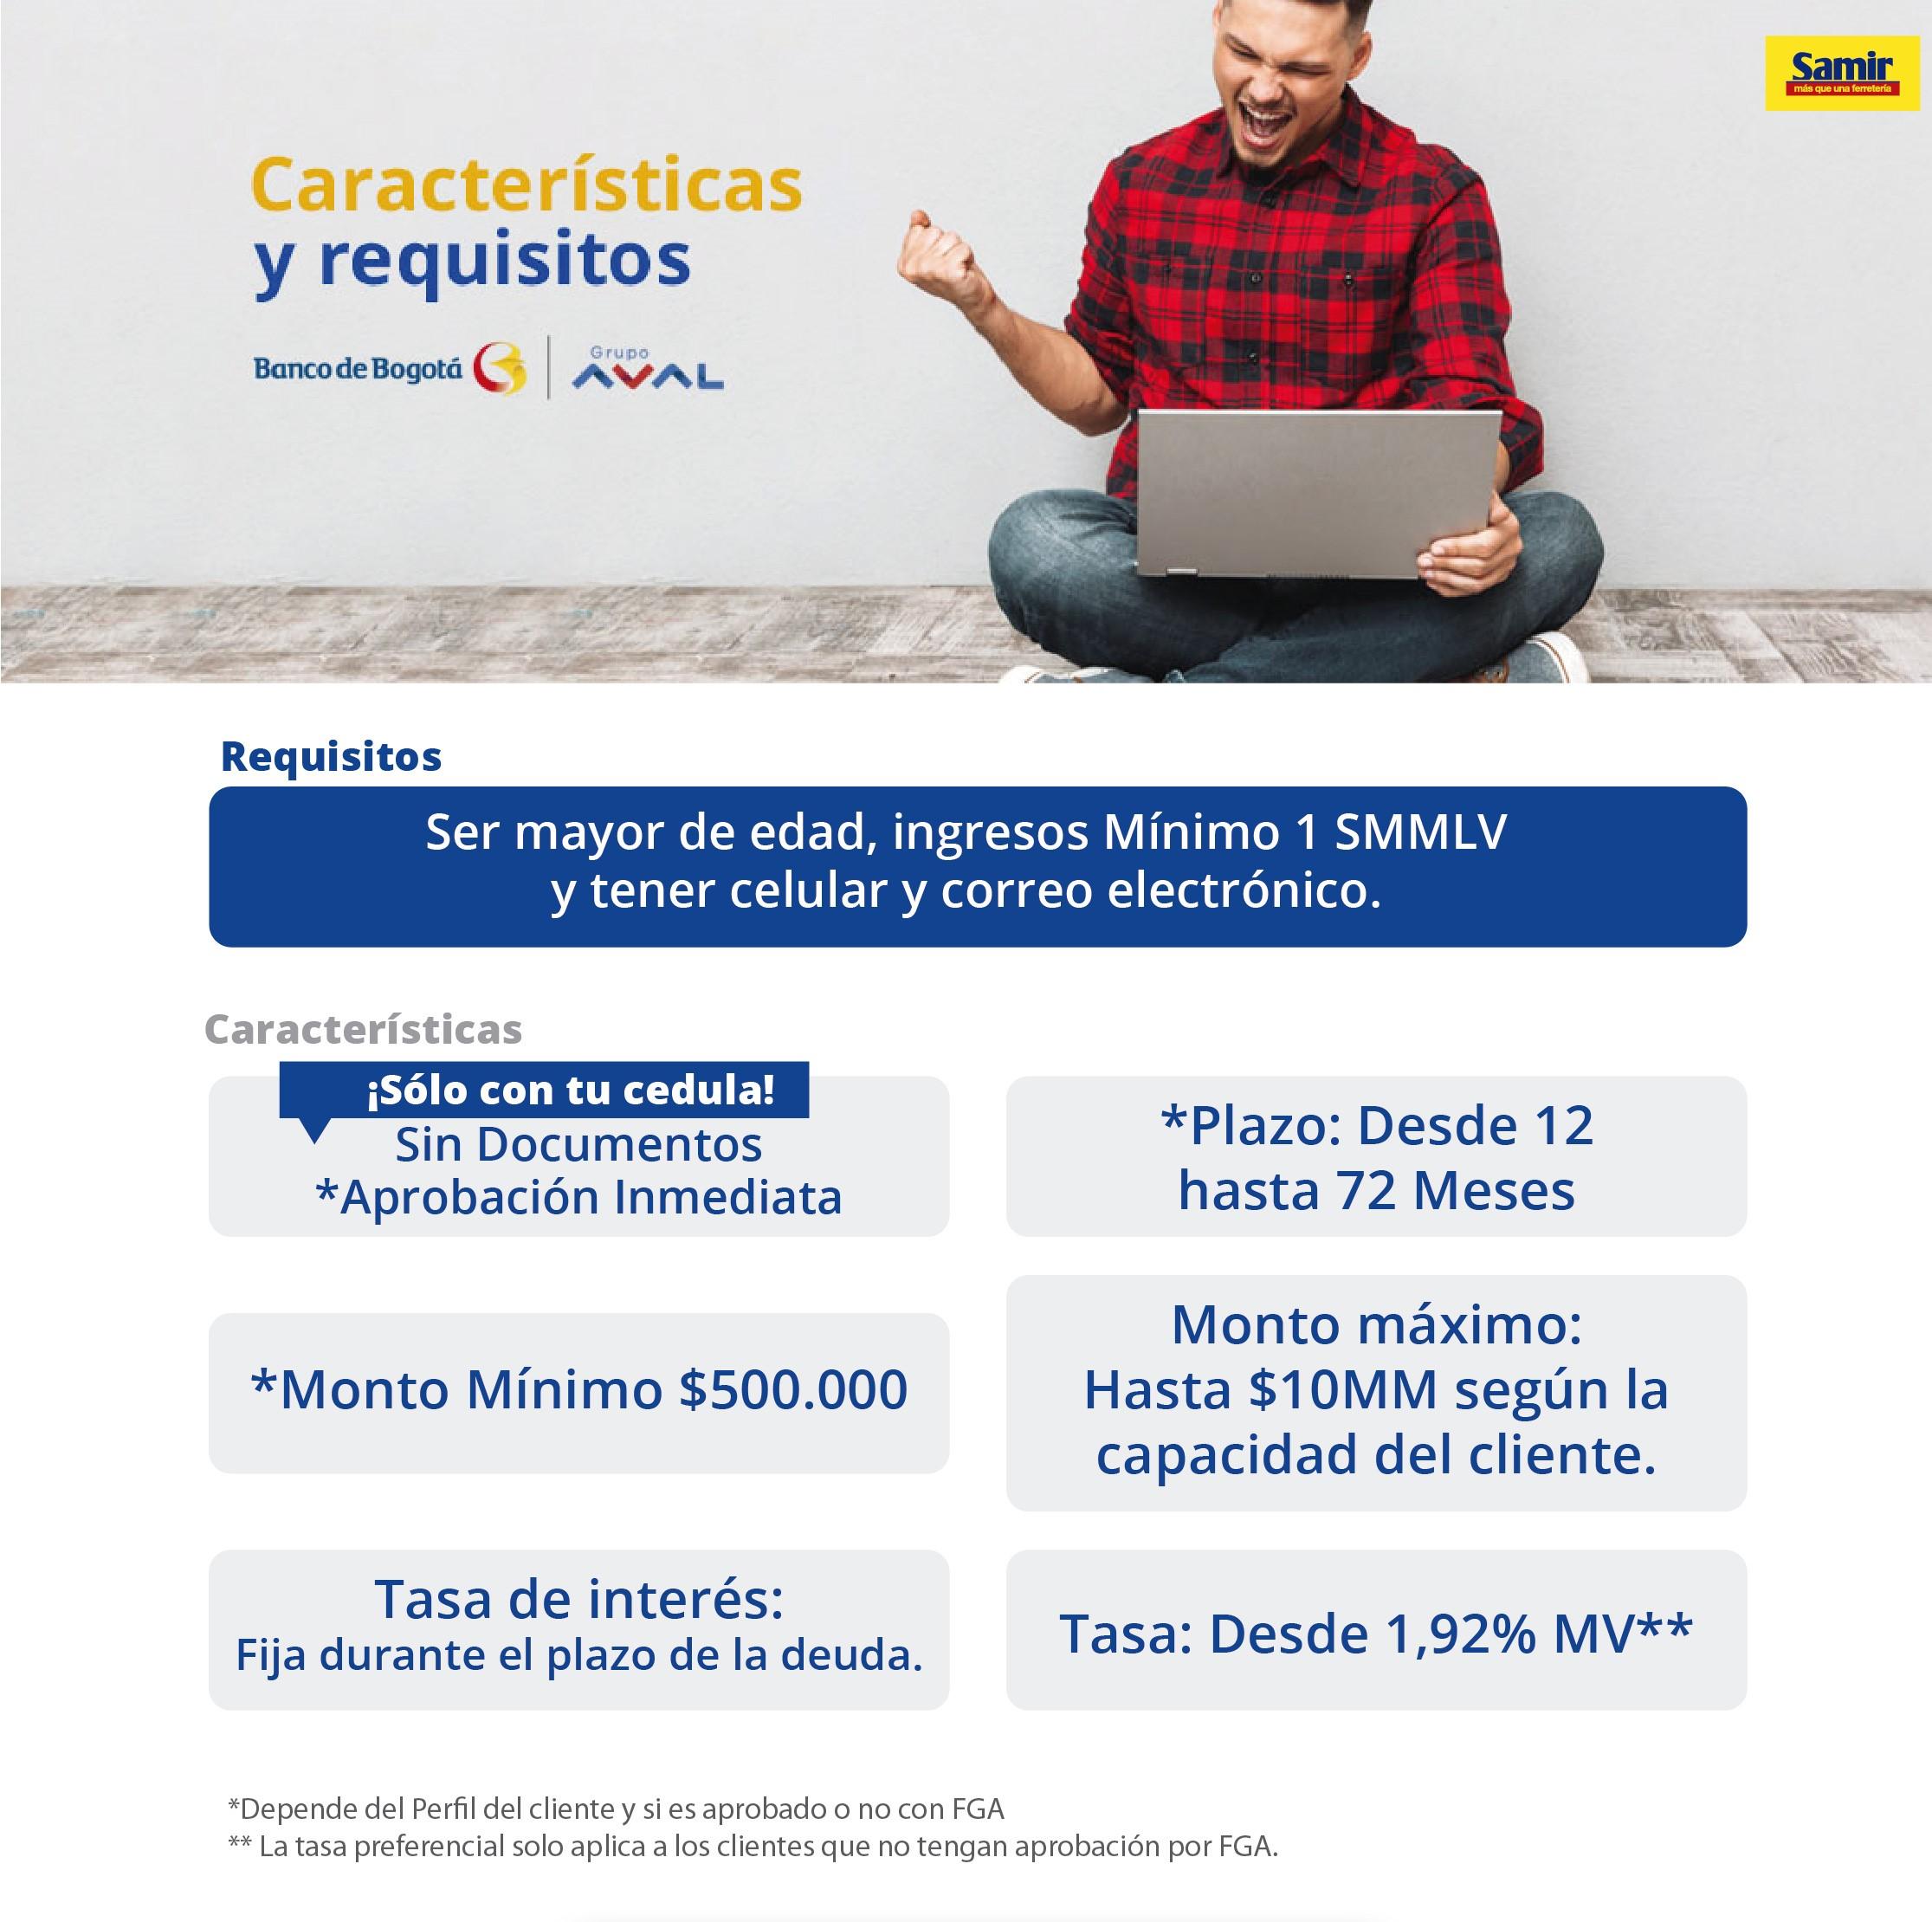 Credi Banco de Bogotá - Ferreteria Samir